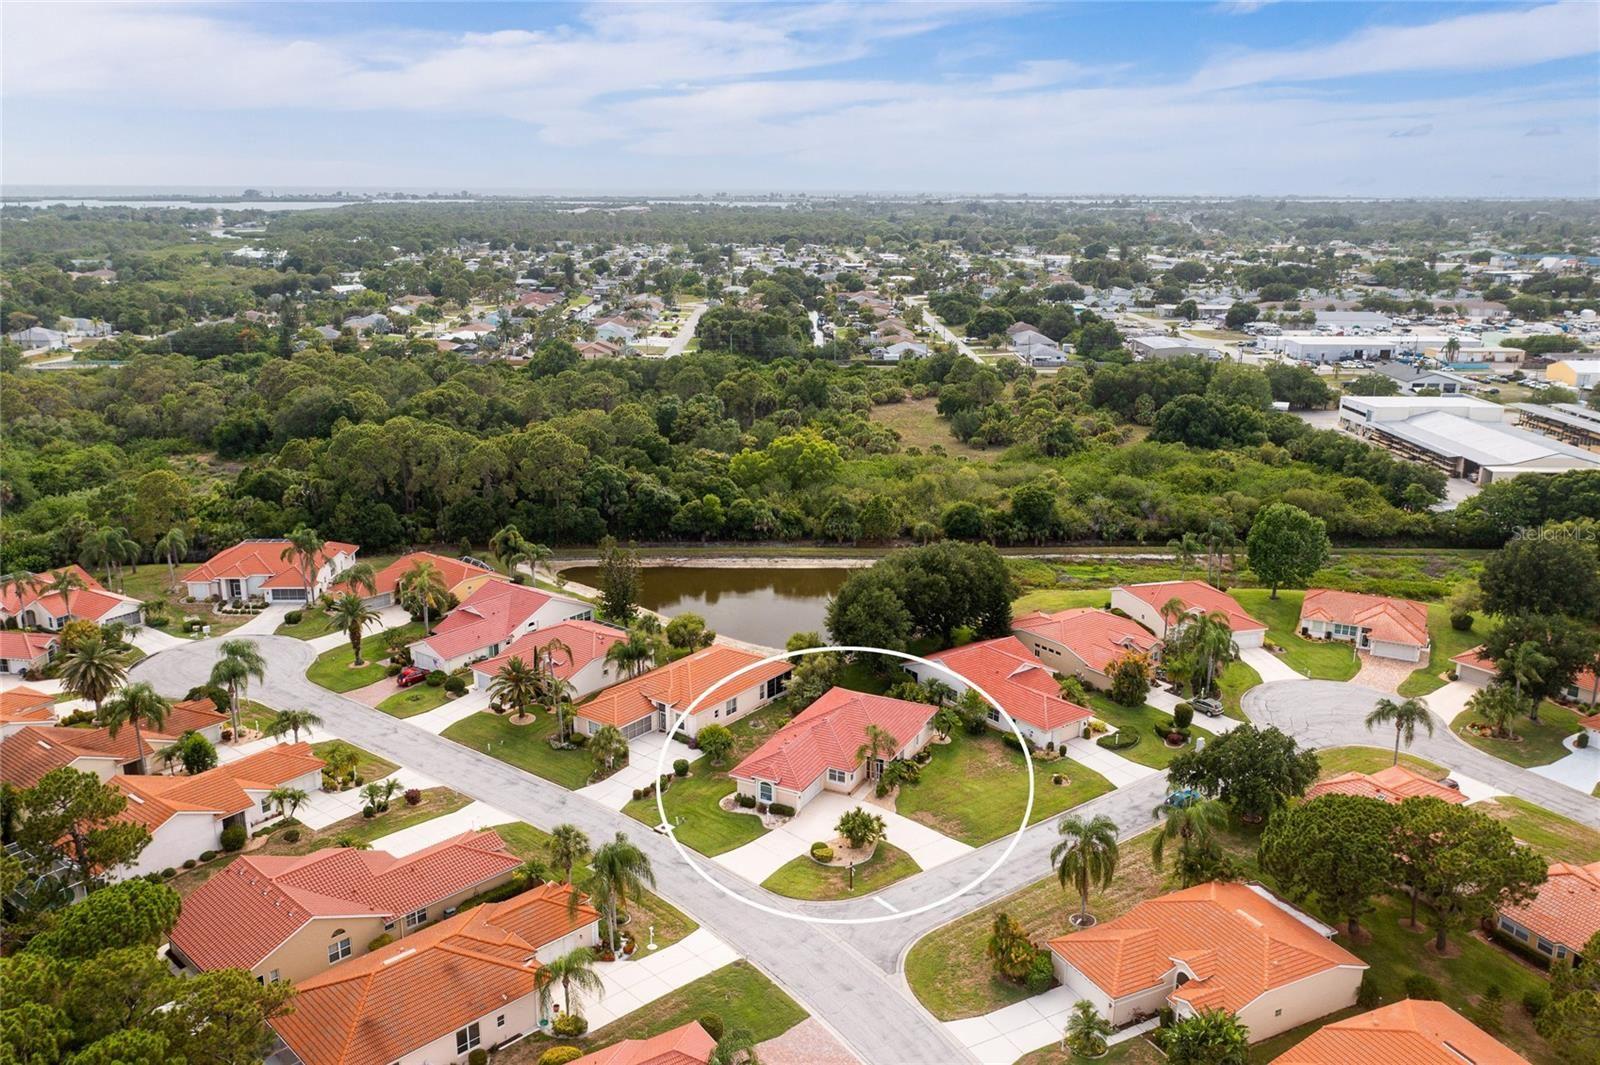 Photo of 8356 CREEKVIEW LANE, ENGLEWOOD, FL 34224 (MLS # D6119507)